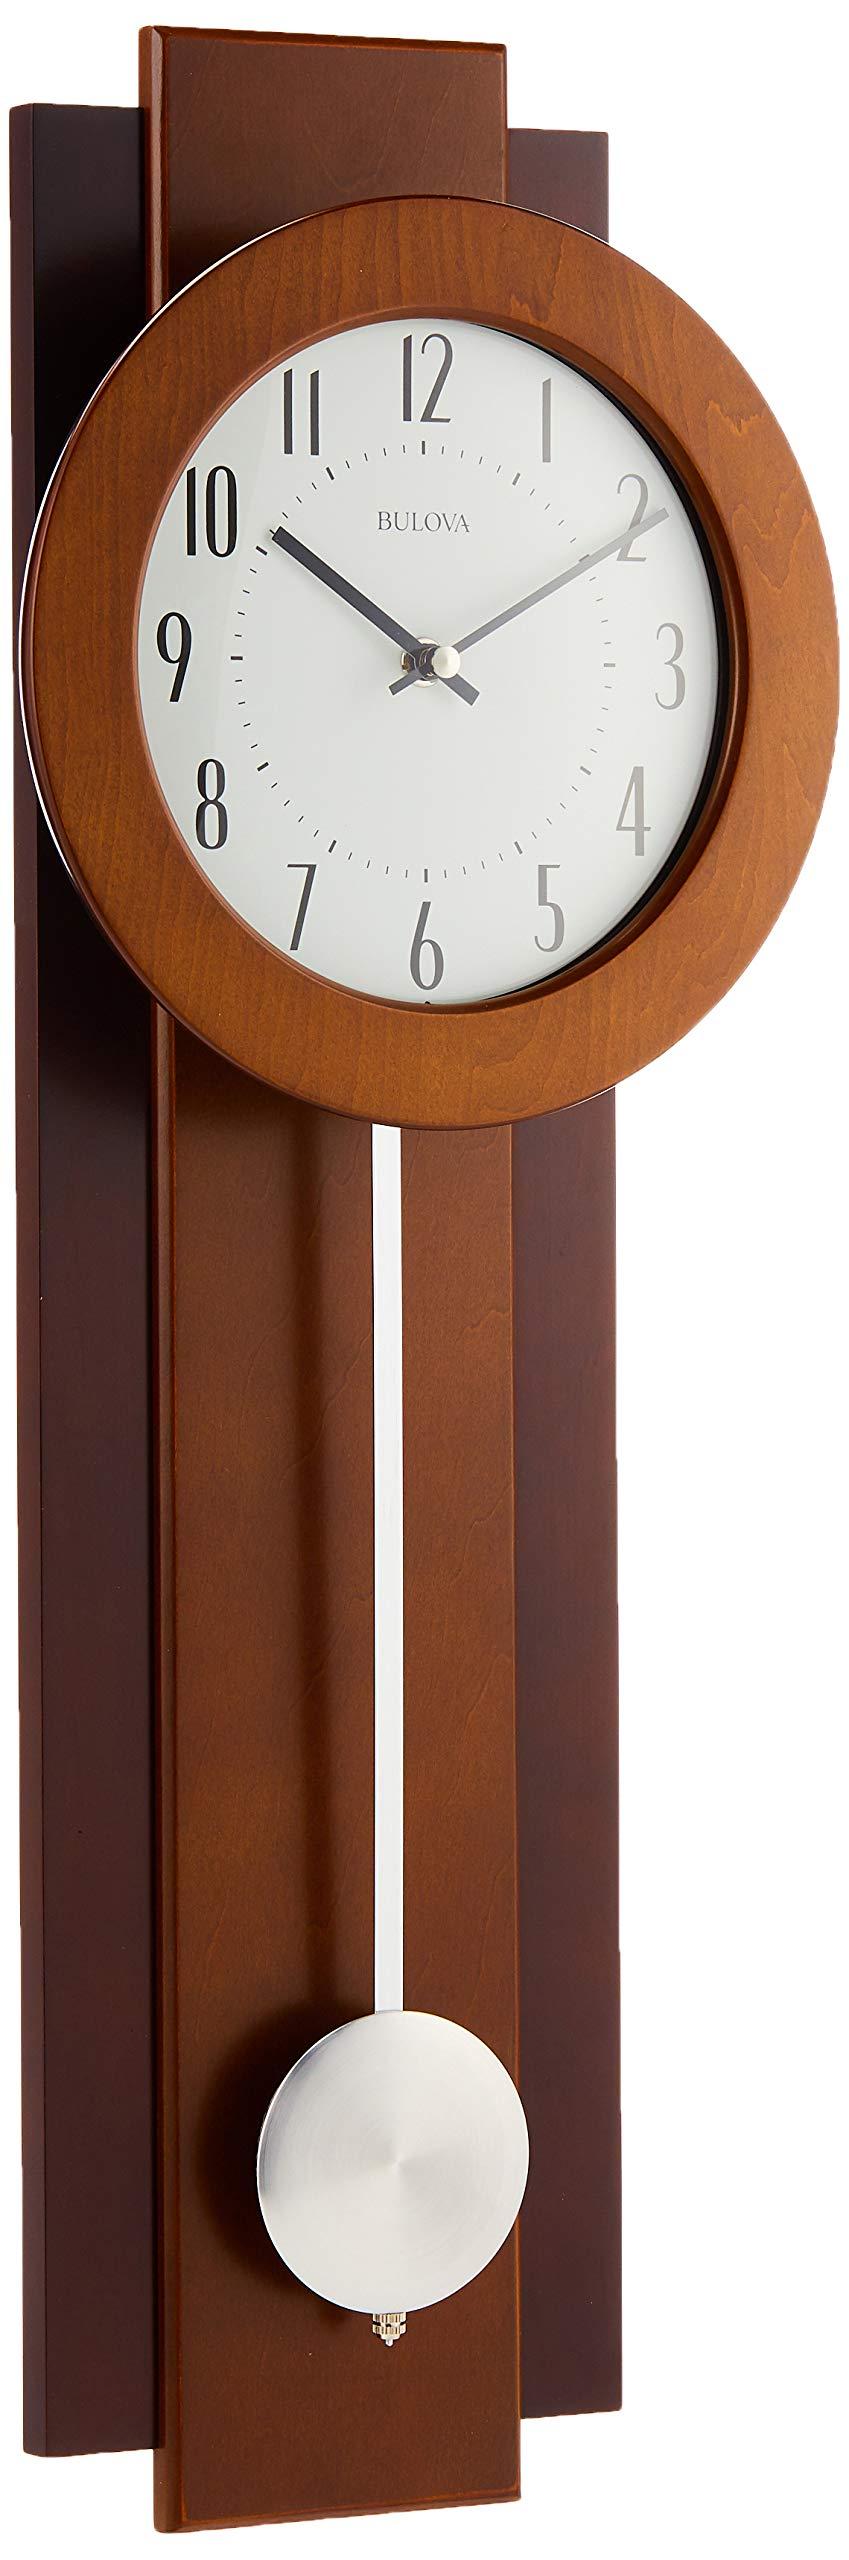 12.75-Inch Trademark Poker Pool Rack Quartz Clock with Solid Wood Frame